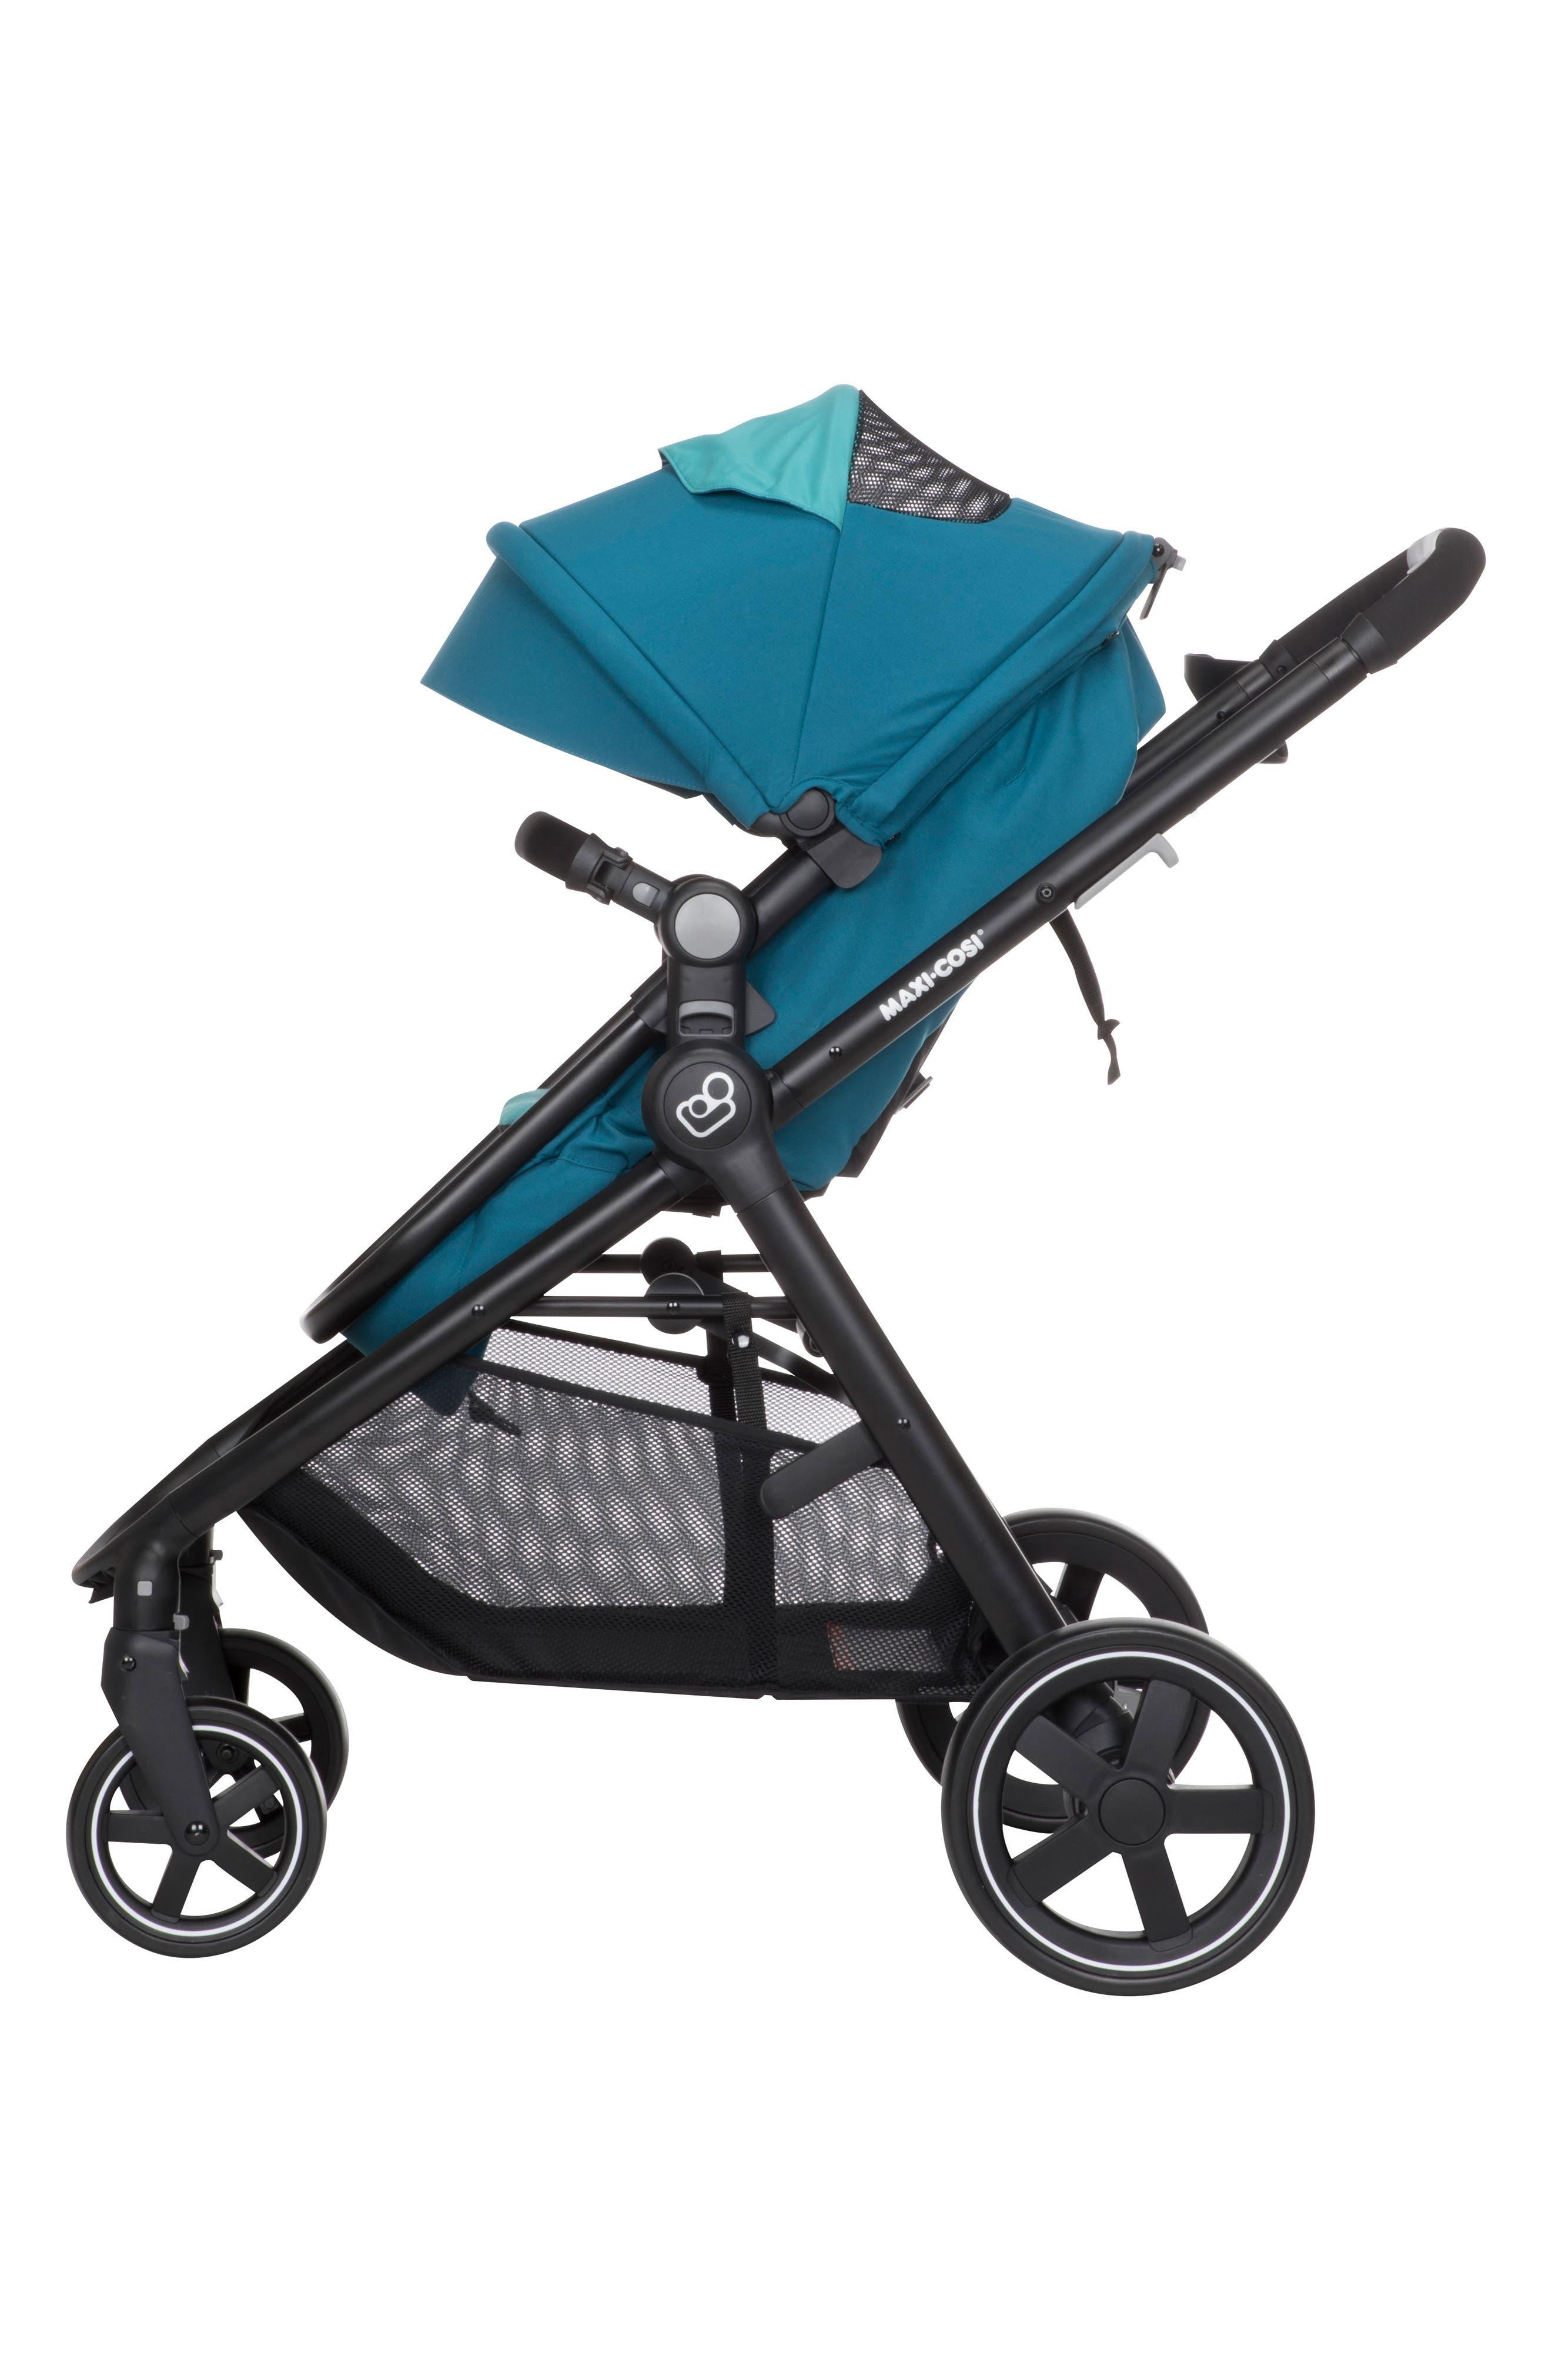 5-1 Mico 30 Infant Car Seat & Zelia Stroller Modular Travel System,                             Alternate thumbnail 9, color,                             Emerald Tide